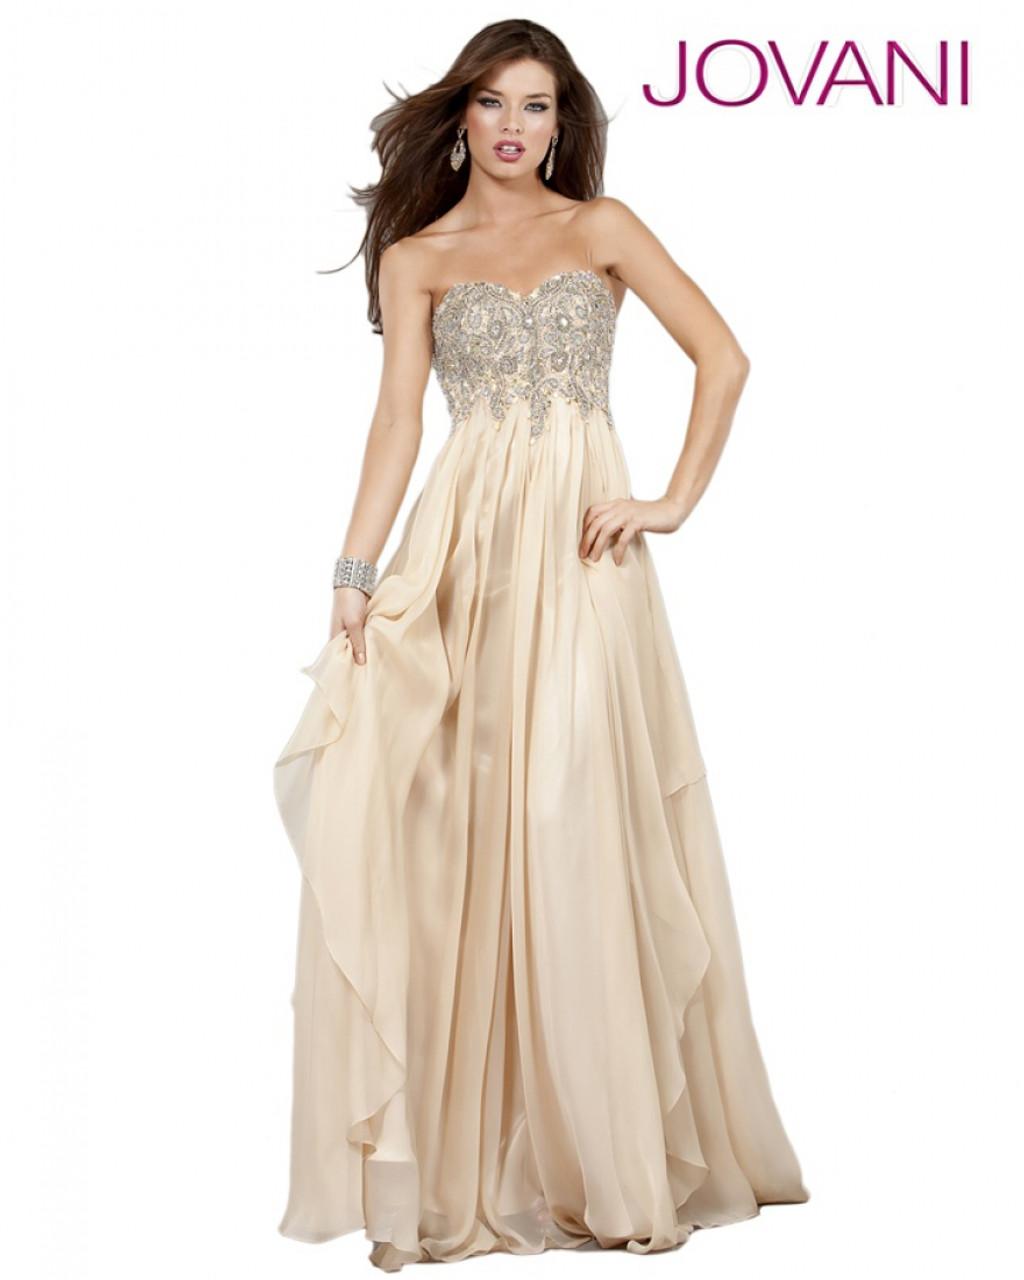 0b49187b45b Jovani 1560 - Strapless Long Dress